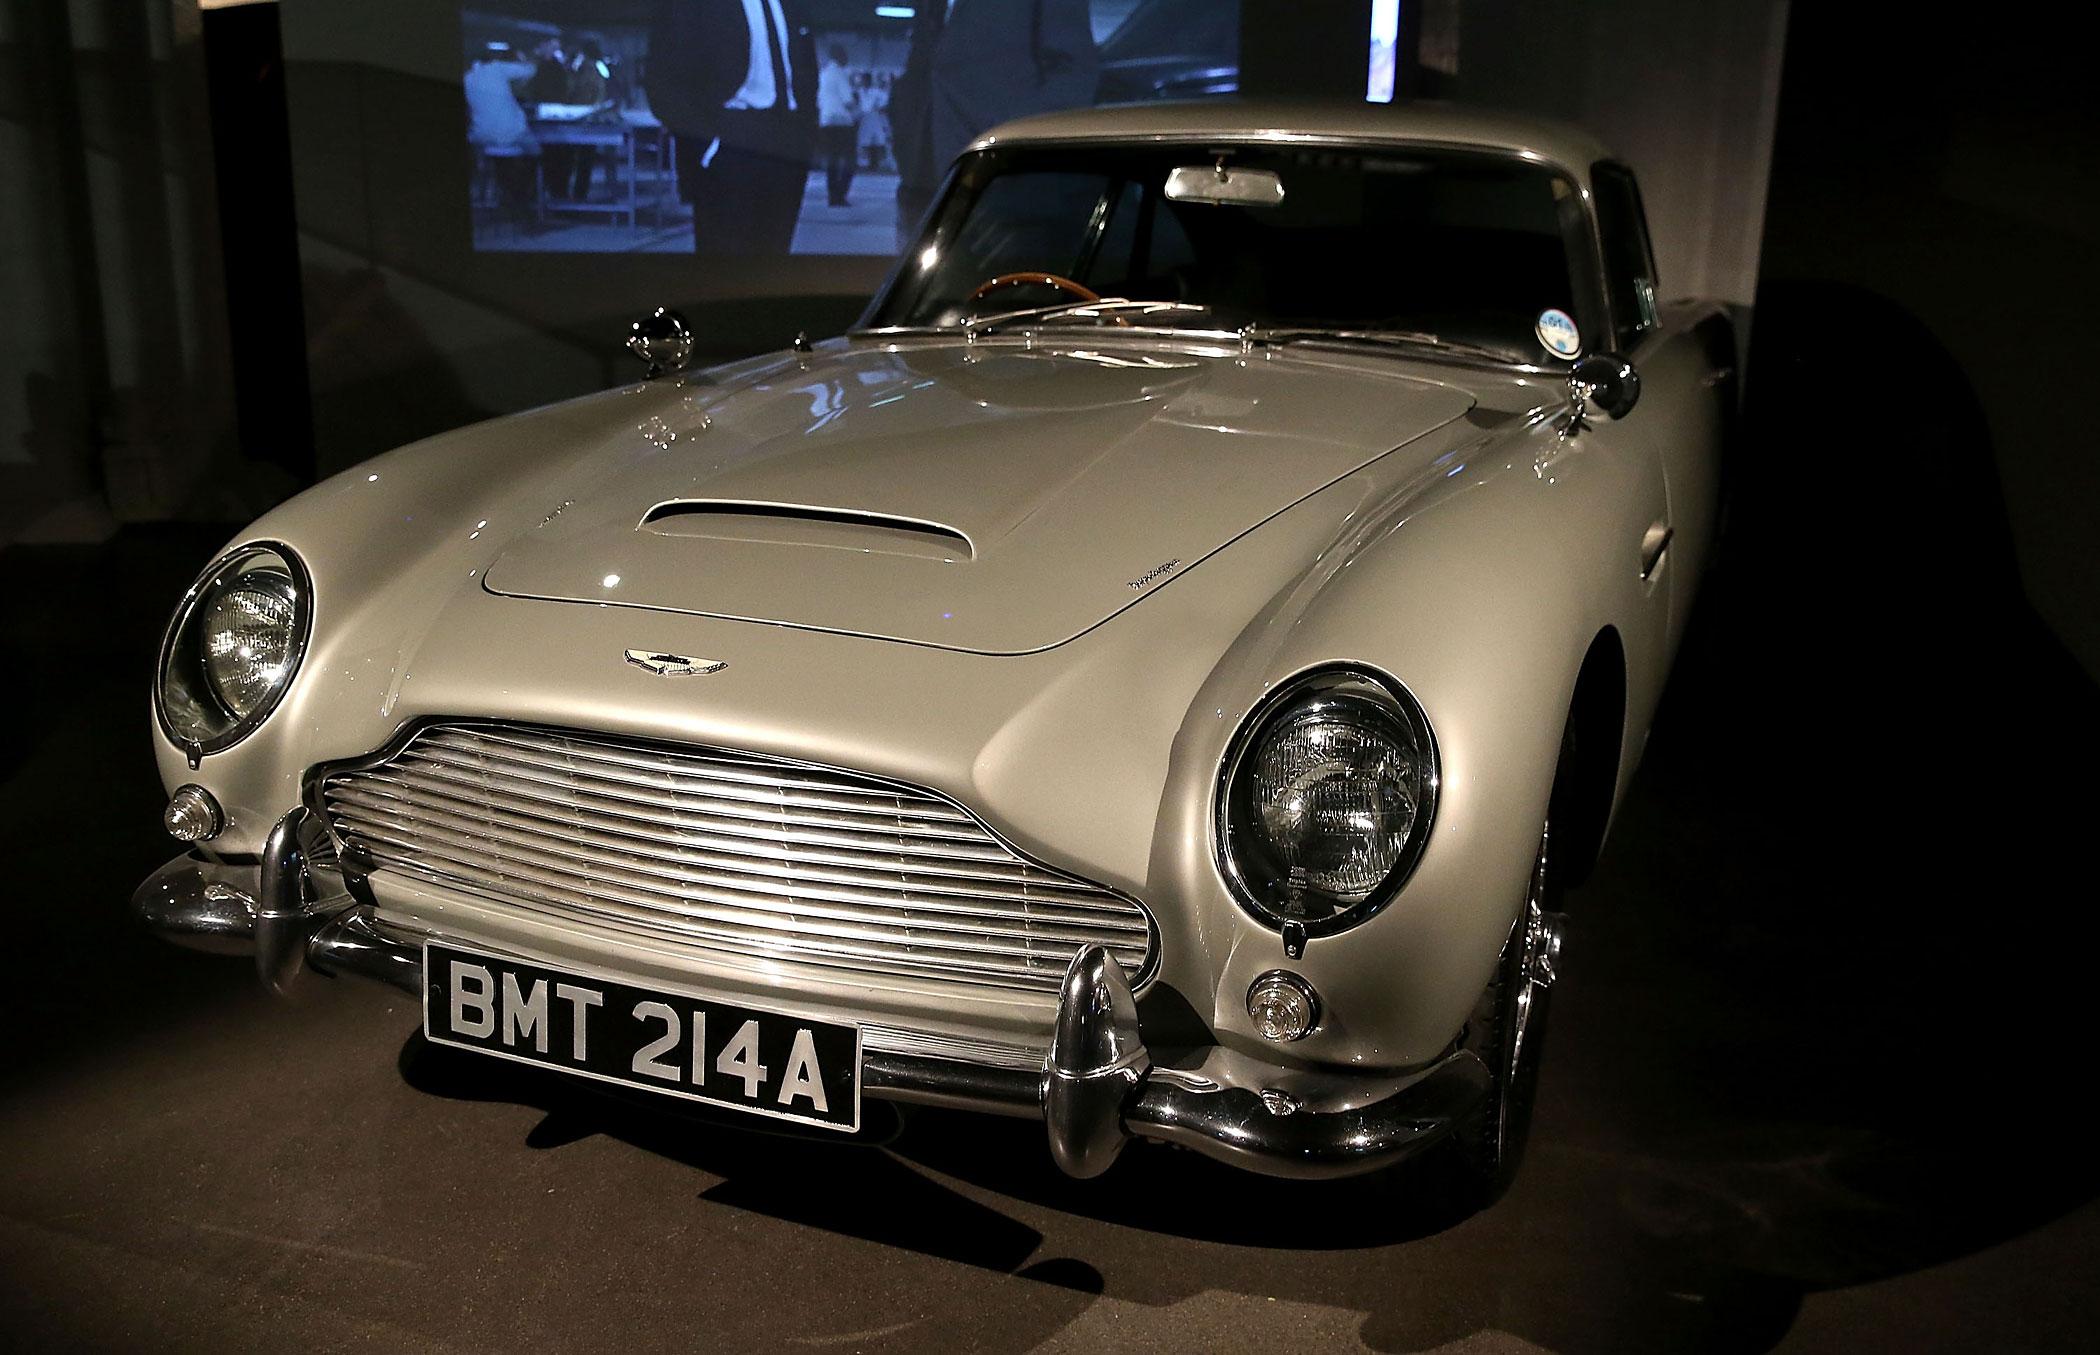 James Bond's Aston Martin DB5 from Skyfall.